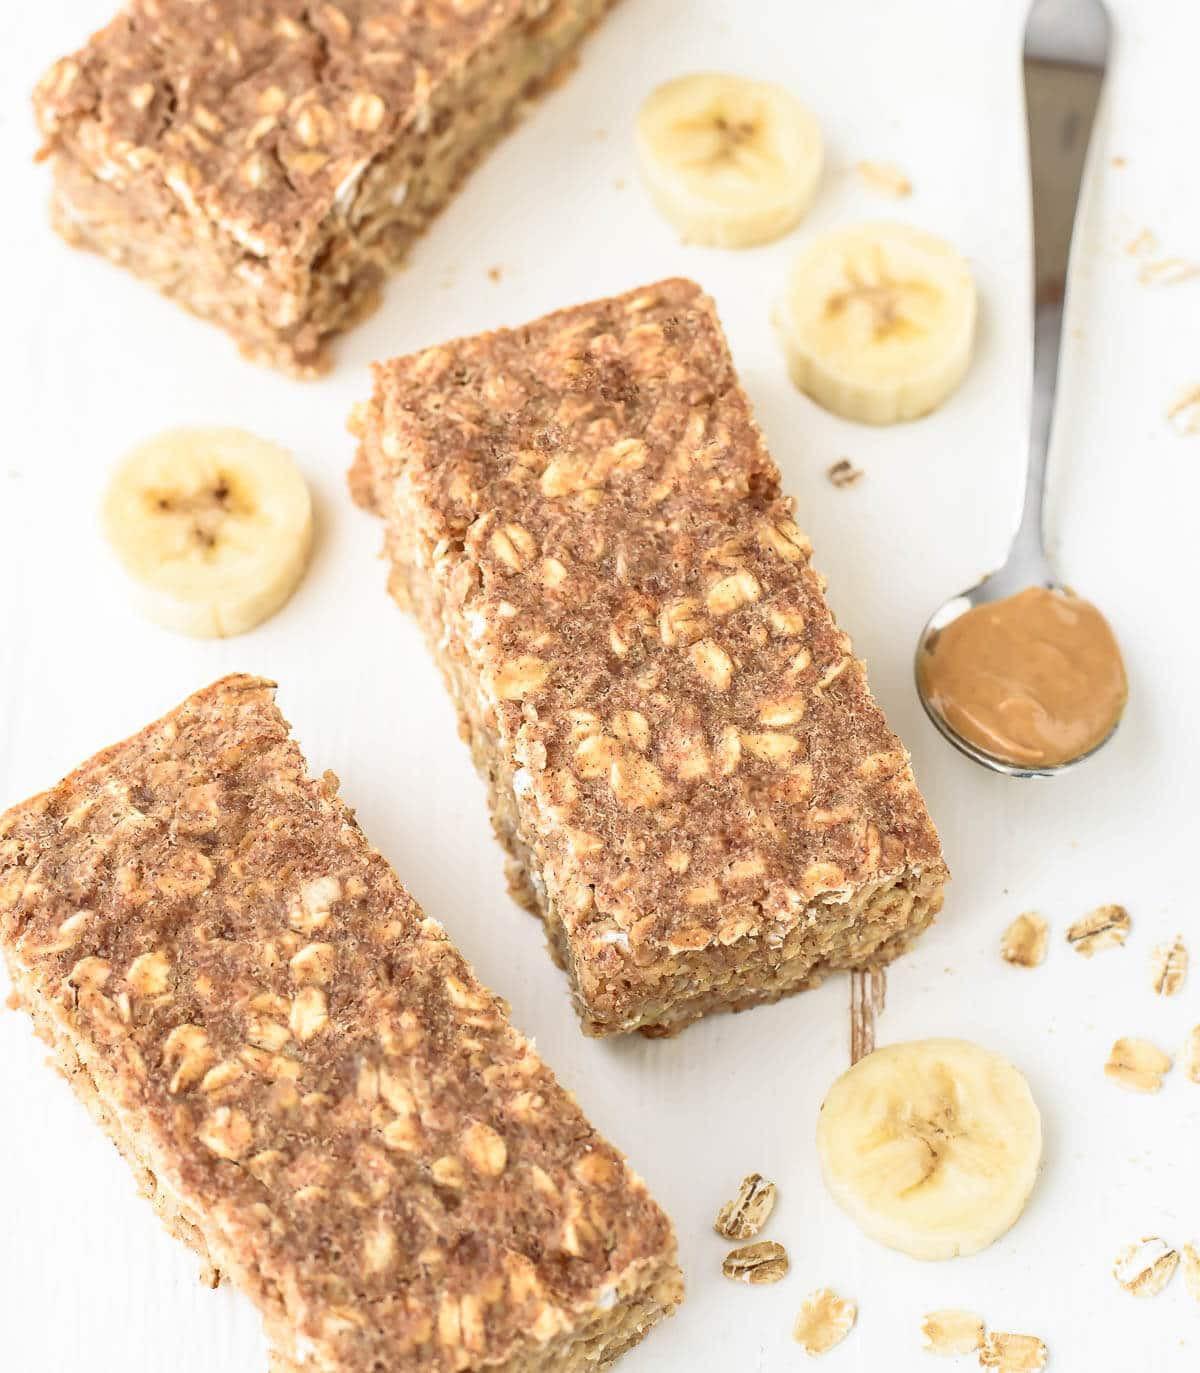 Healthy Oatmeal Breakfast Bars Recipe Easy  Oatmeal Breakfast Bars